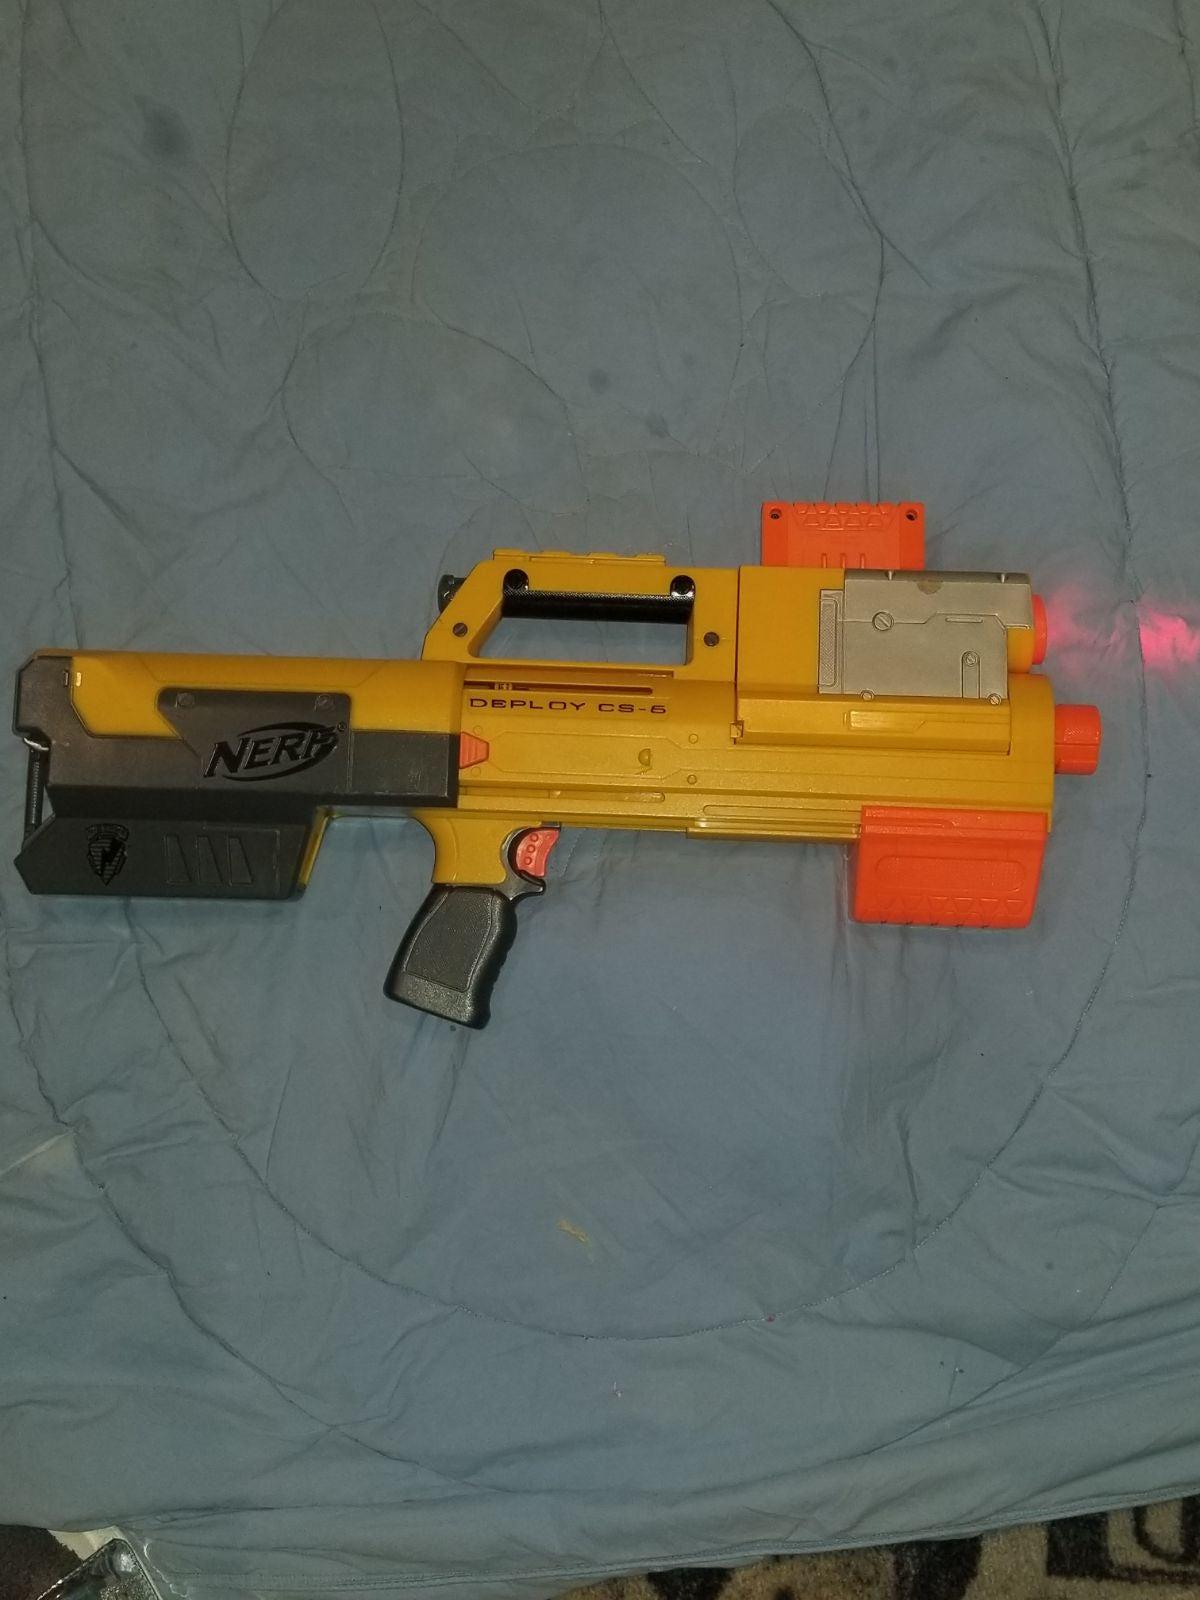 Nerf gun Deploy CS-6